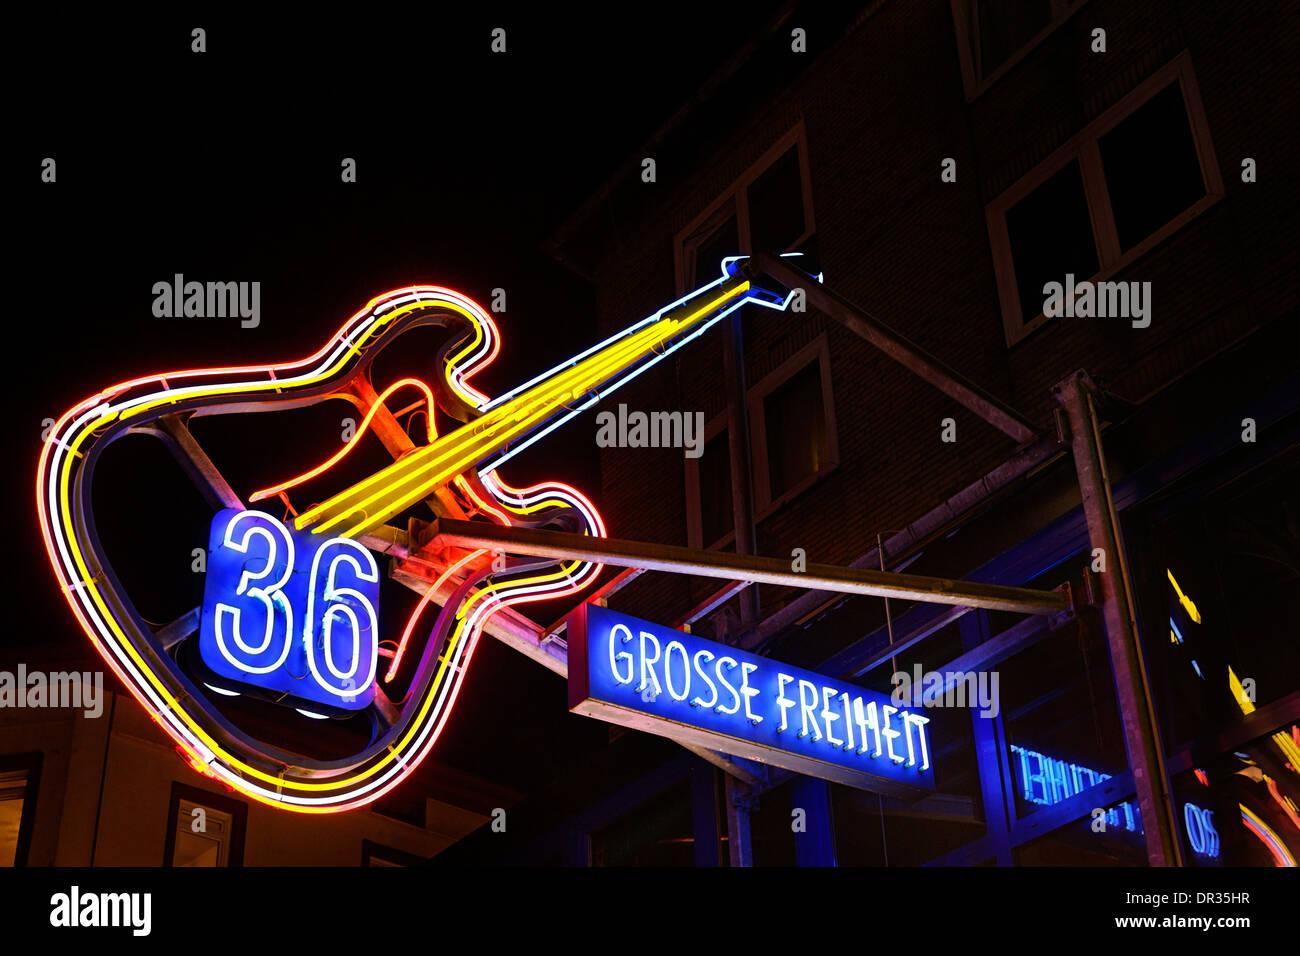 Grosse Freiheit 36, legendary neighborhood club, neon sign, St. Pauli, Reeperbahn, Hamburg, Germany, Europe - Stock Image